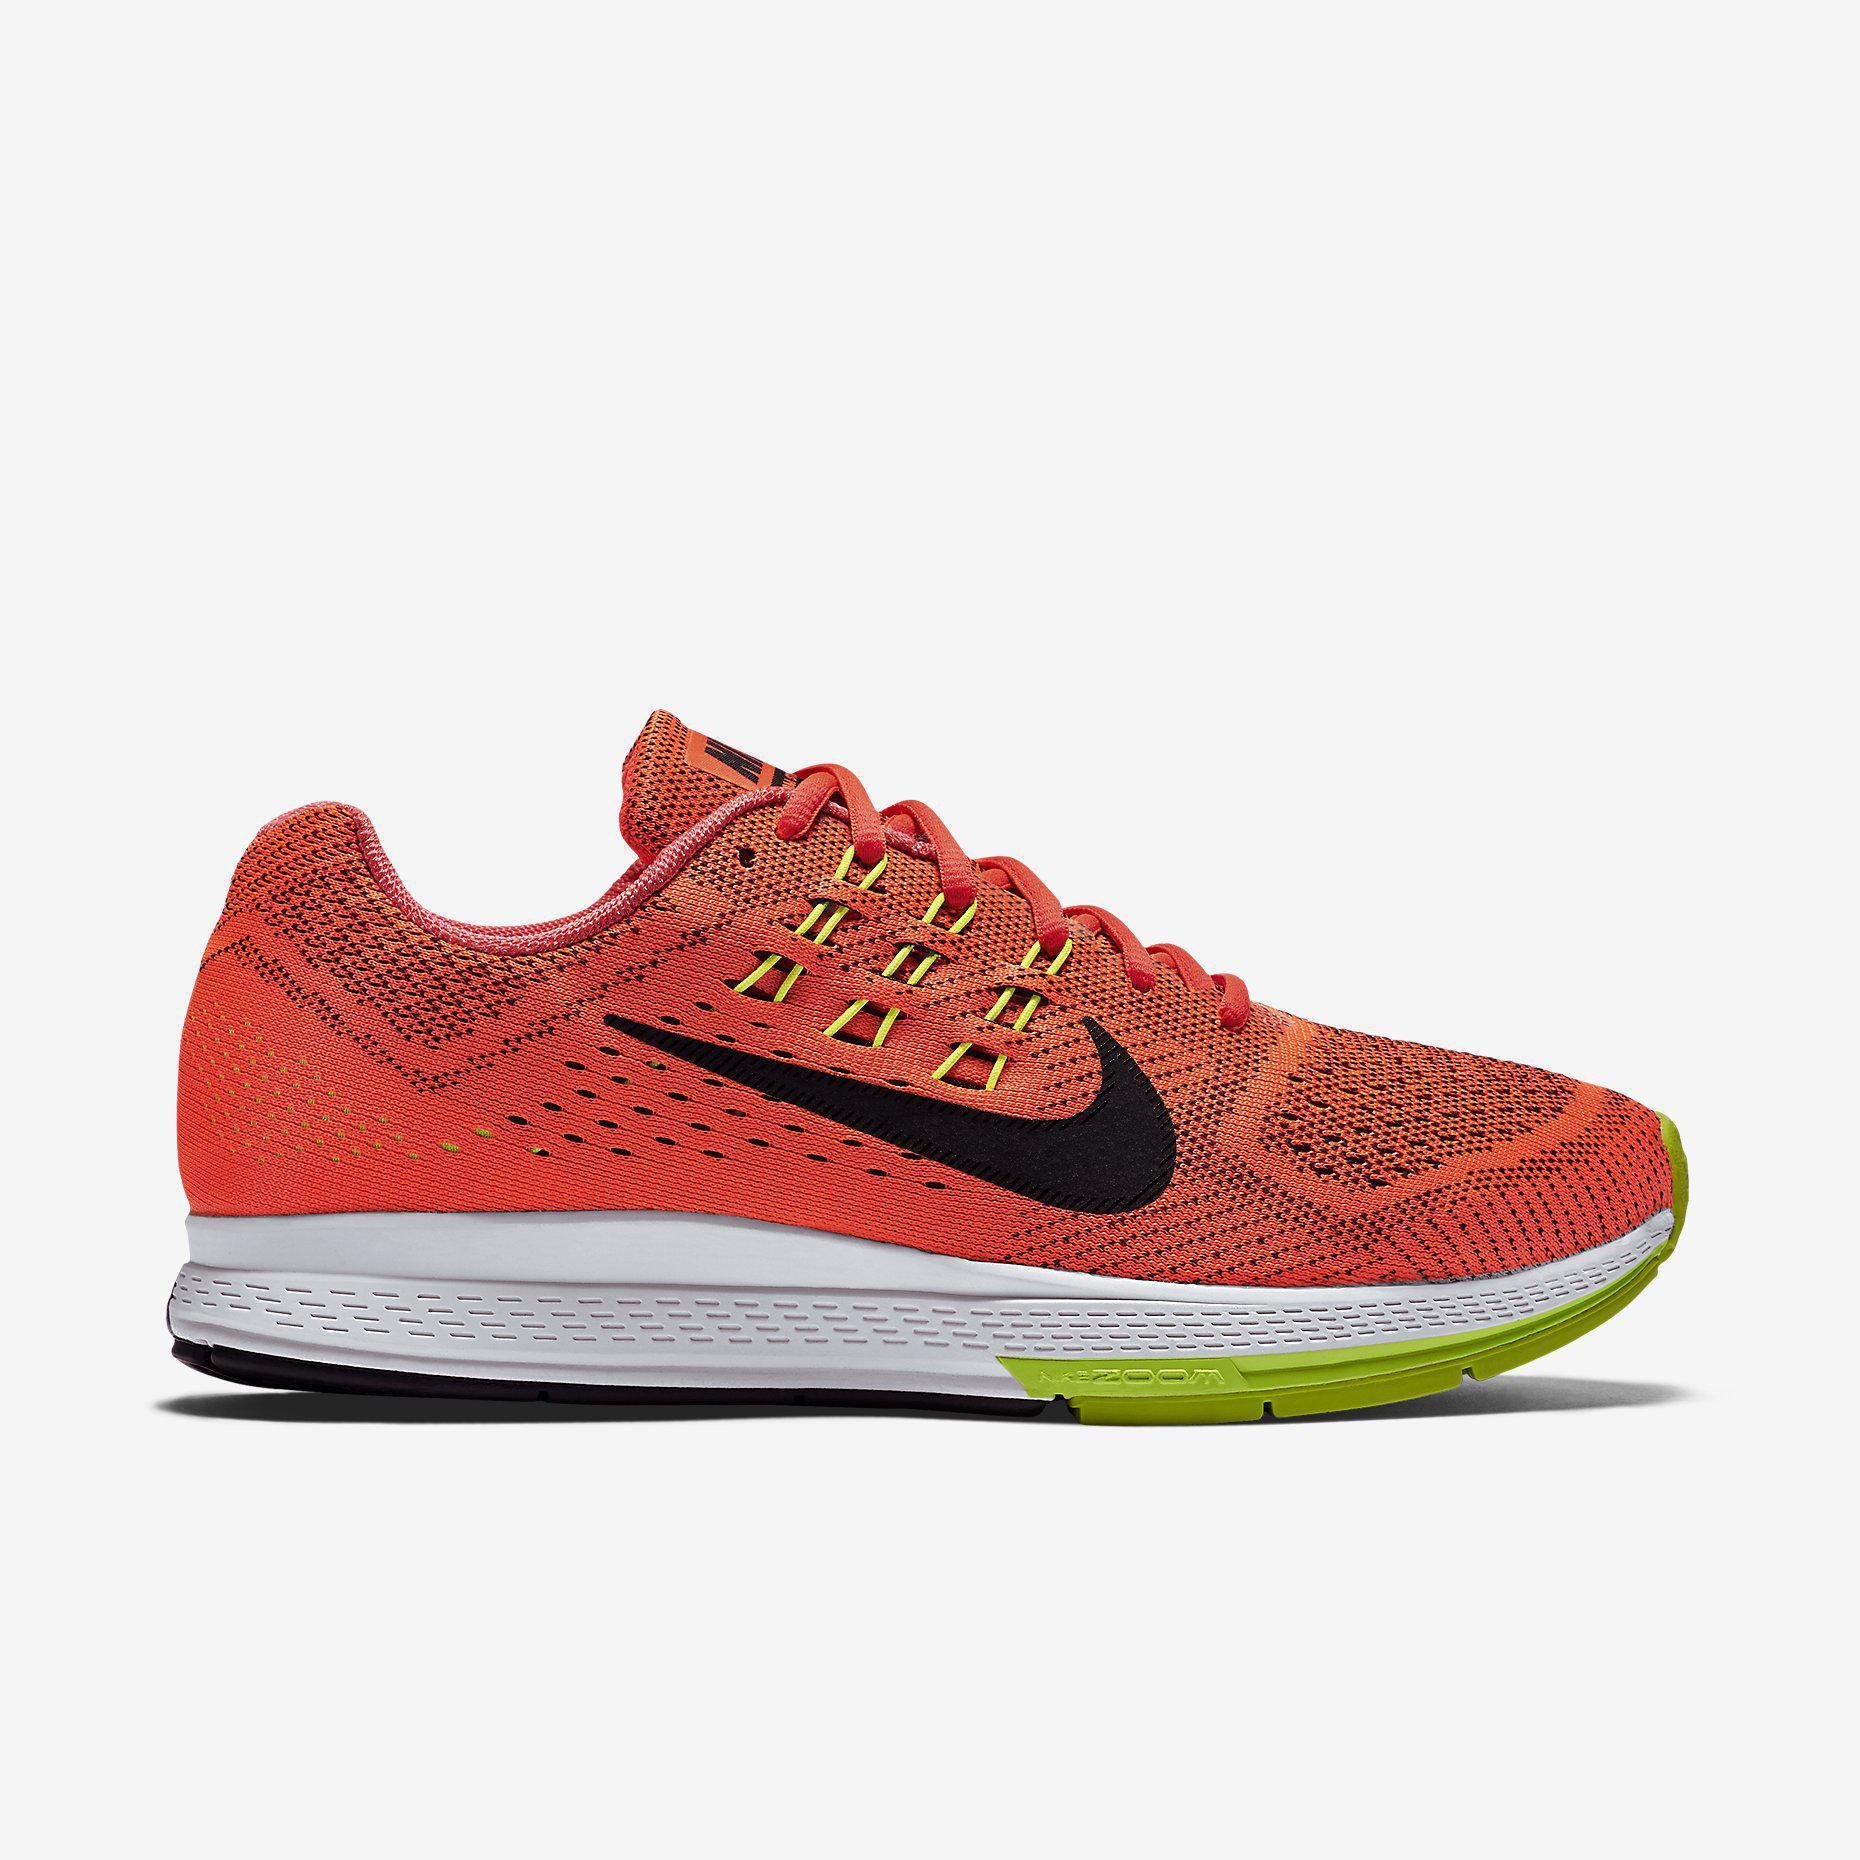 best website 5284f b2b5d Nike Mens Air Zoom Structure 18 Running Shoes - Bright Crimson Black -  Tennisnuts.com